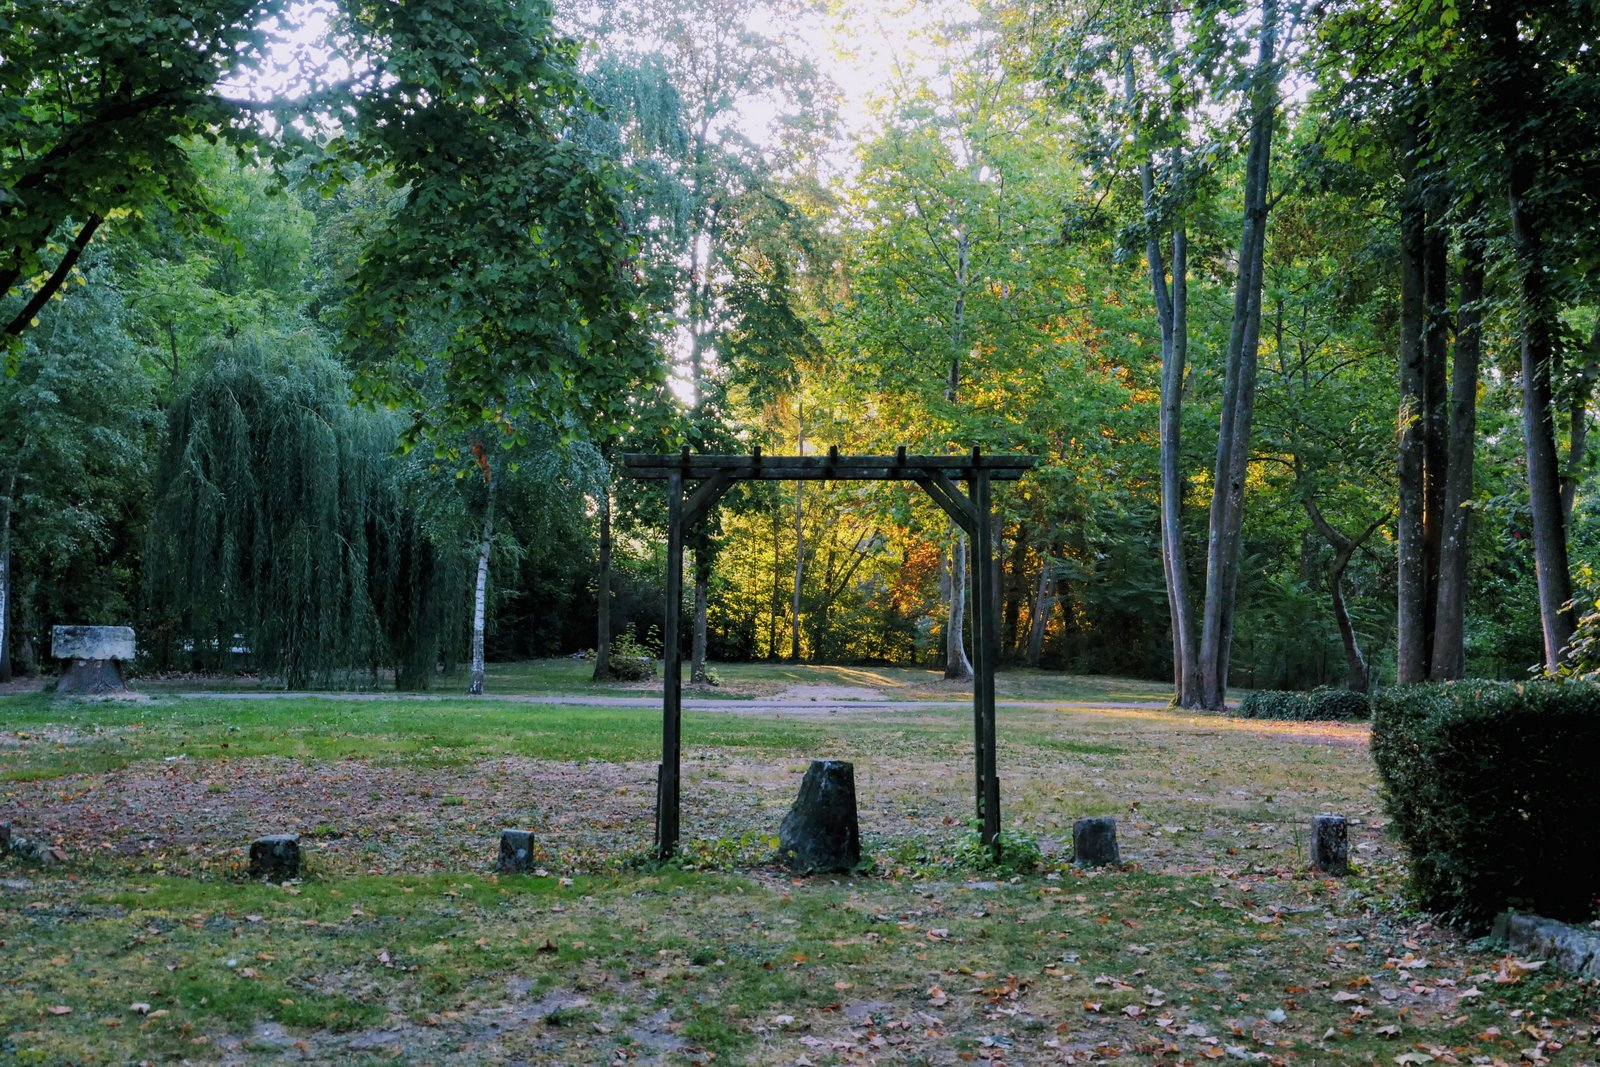 Campingplatz im Herbst